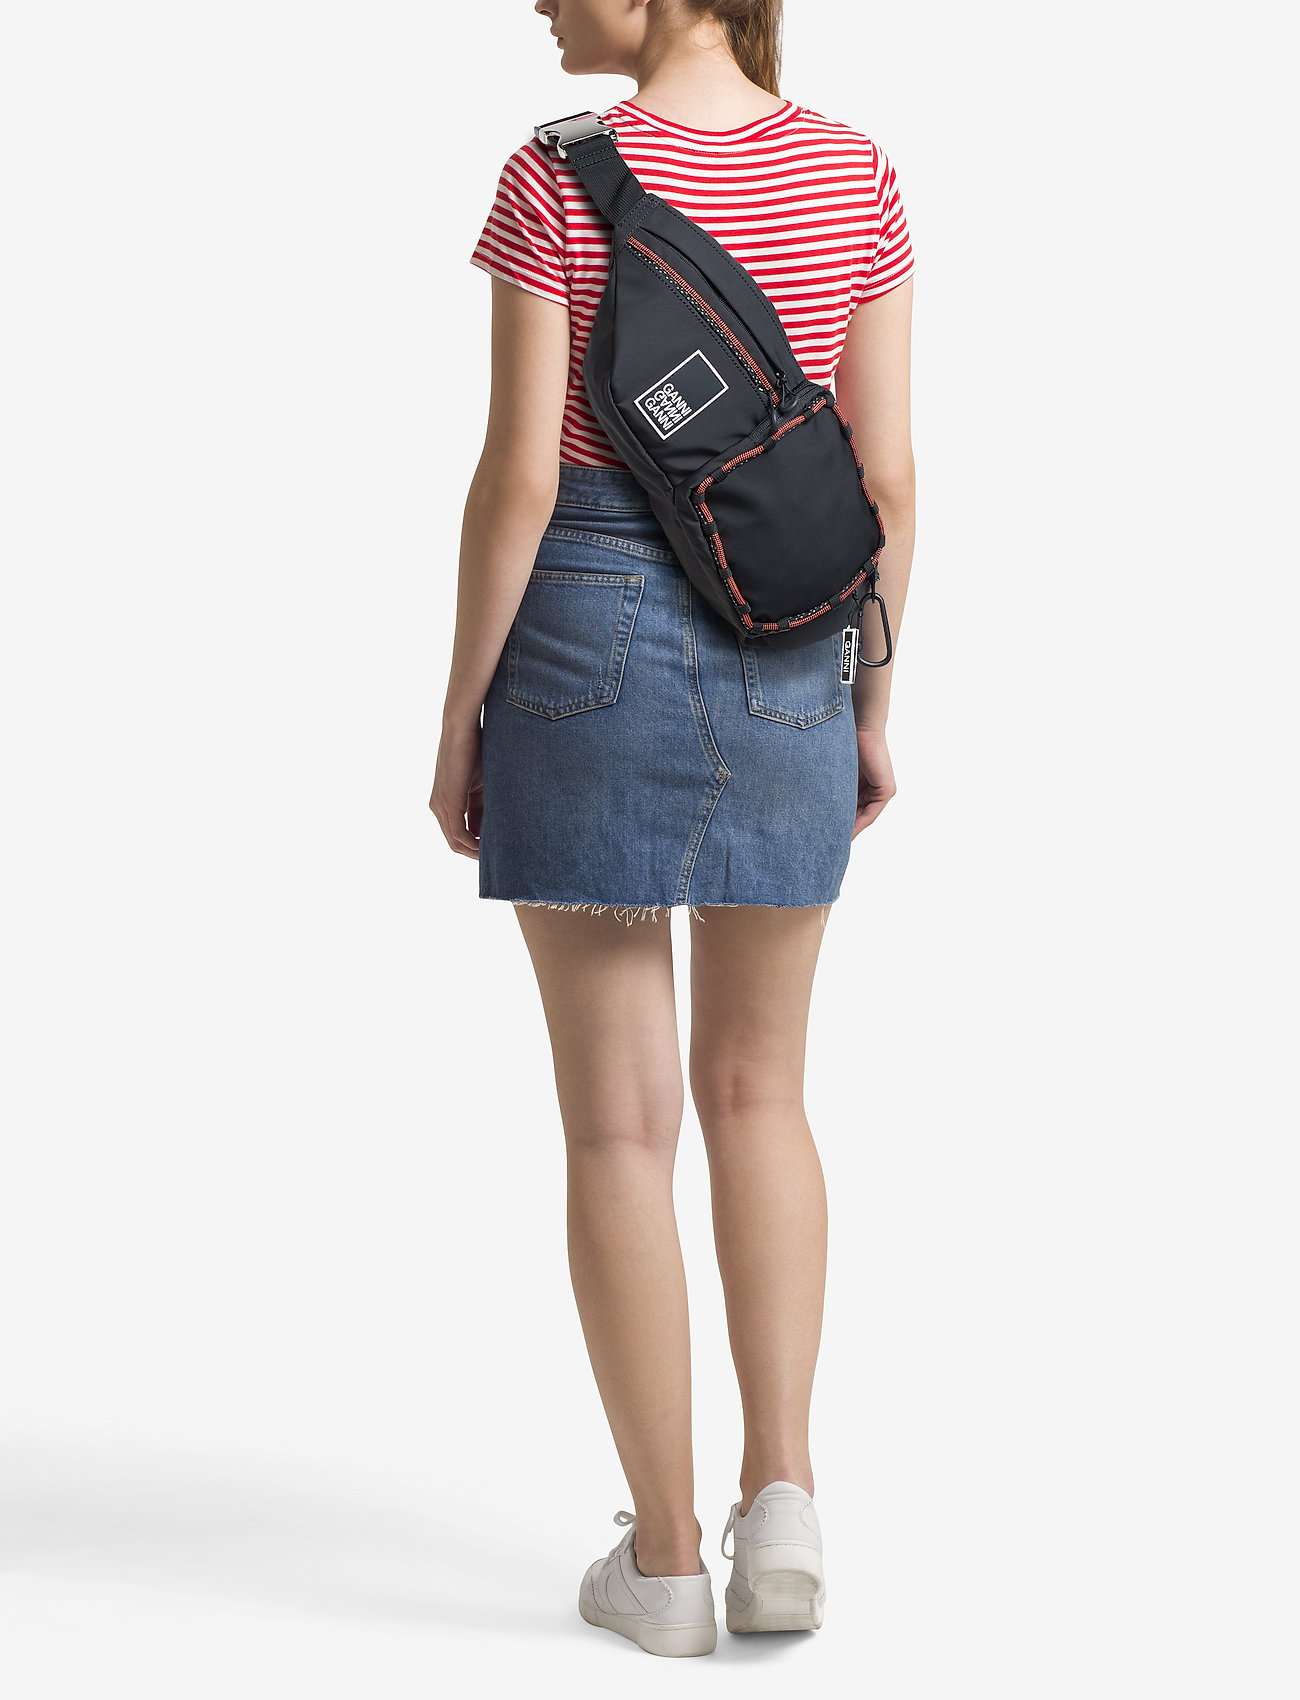 Ganni Tech Fabric Bags - BLACK